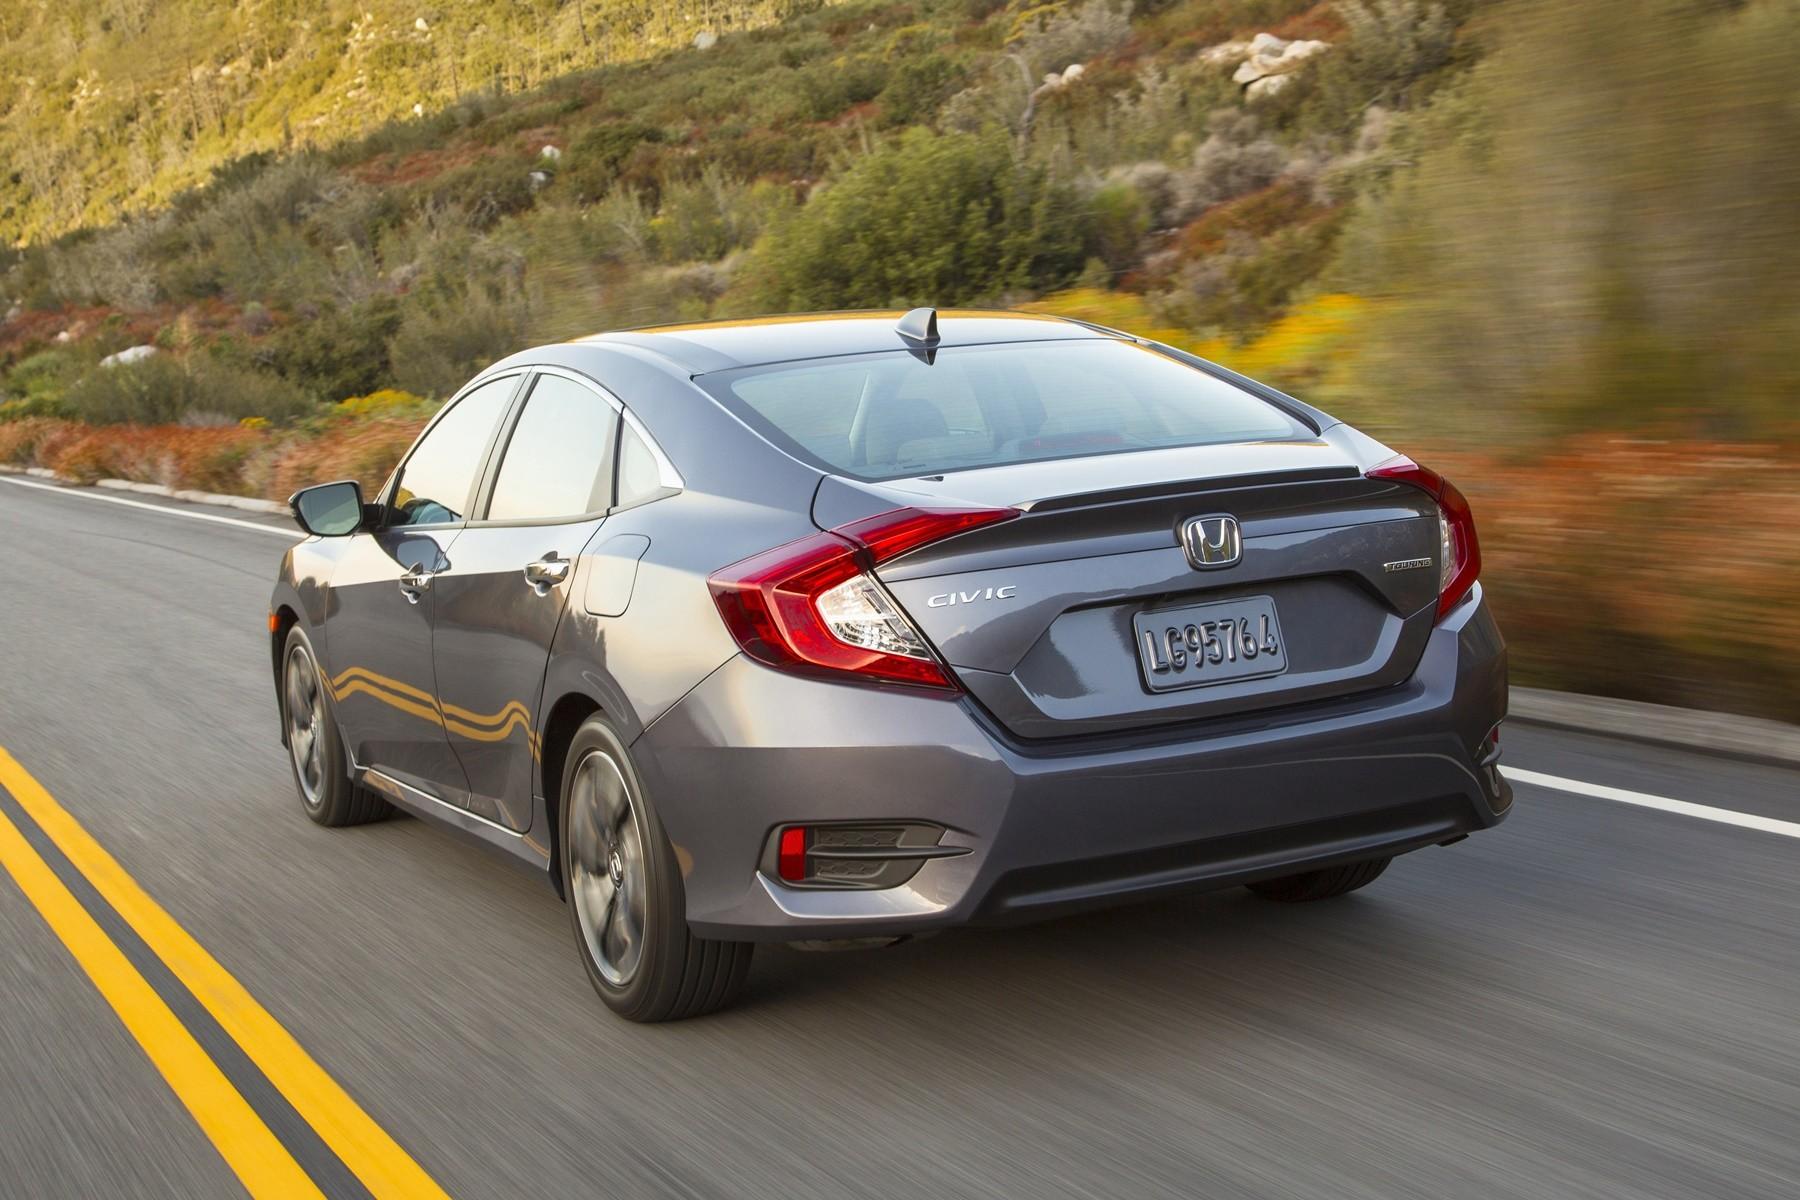 2016 Honda Civic Sedan Review - autoevolution